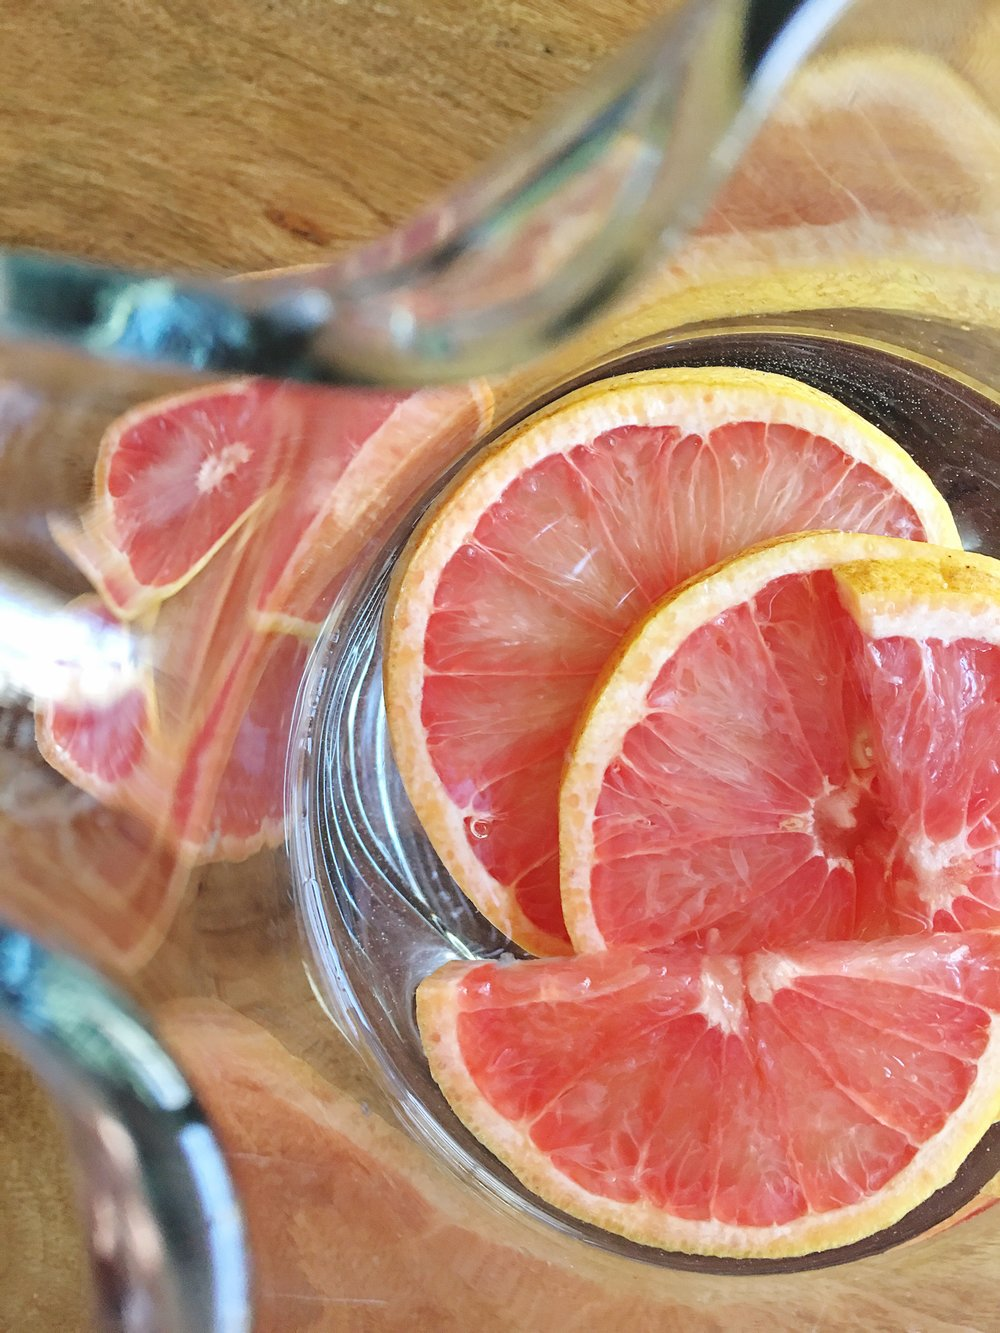 Grapefruit-Slices-Pitcher.jpg